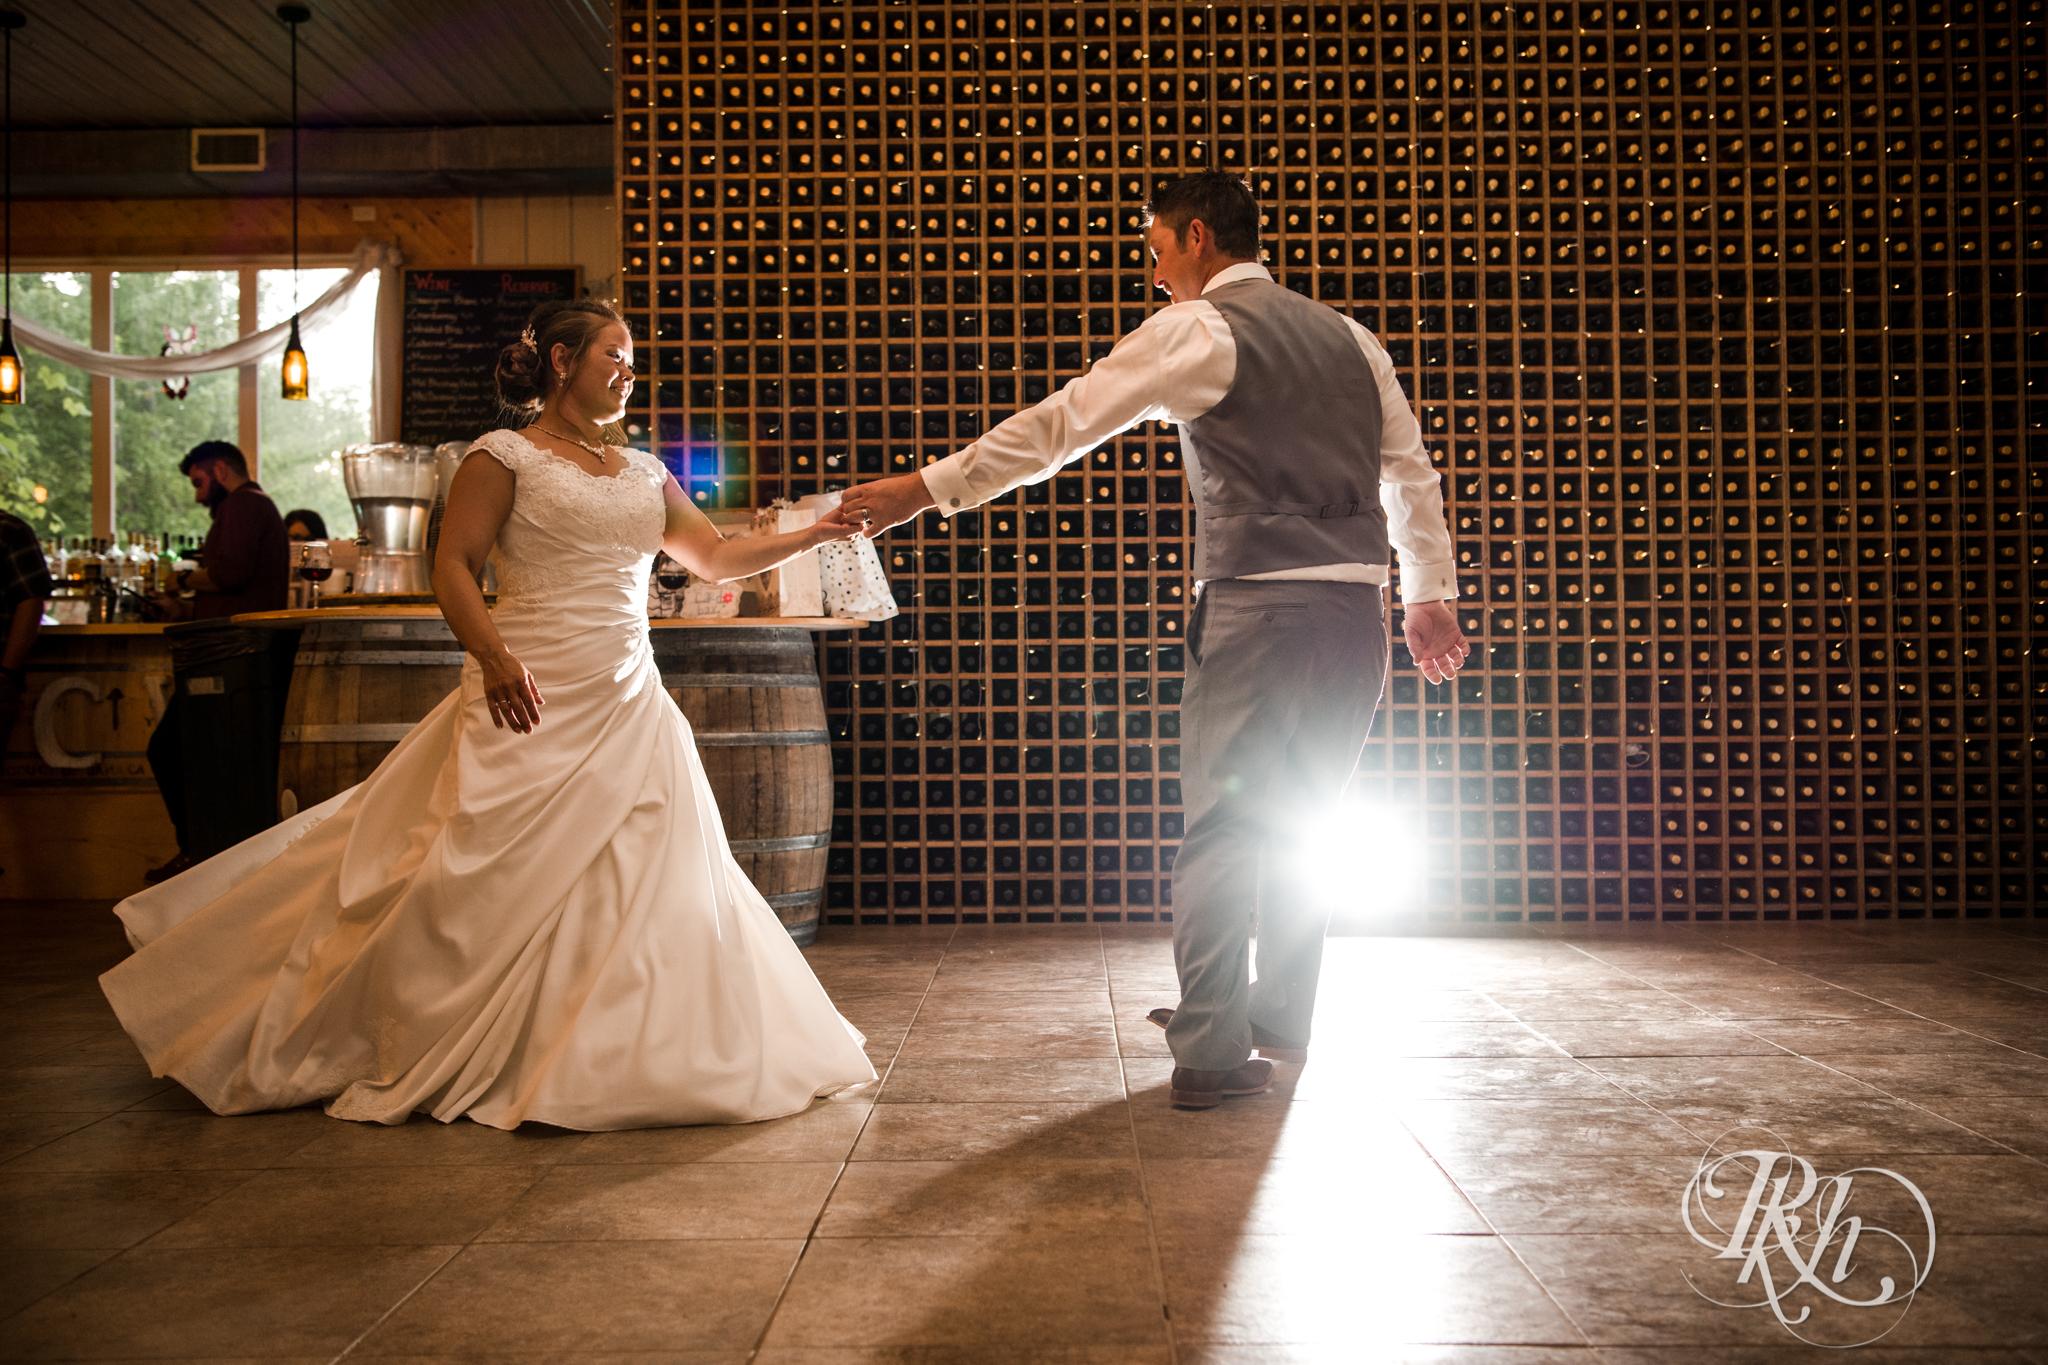 Ally & Nick - Minnesota Wedding Photography - Next Chapter Winery - RKH Images - Blog (42 of 57).jpg